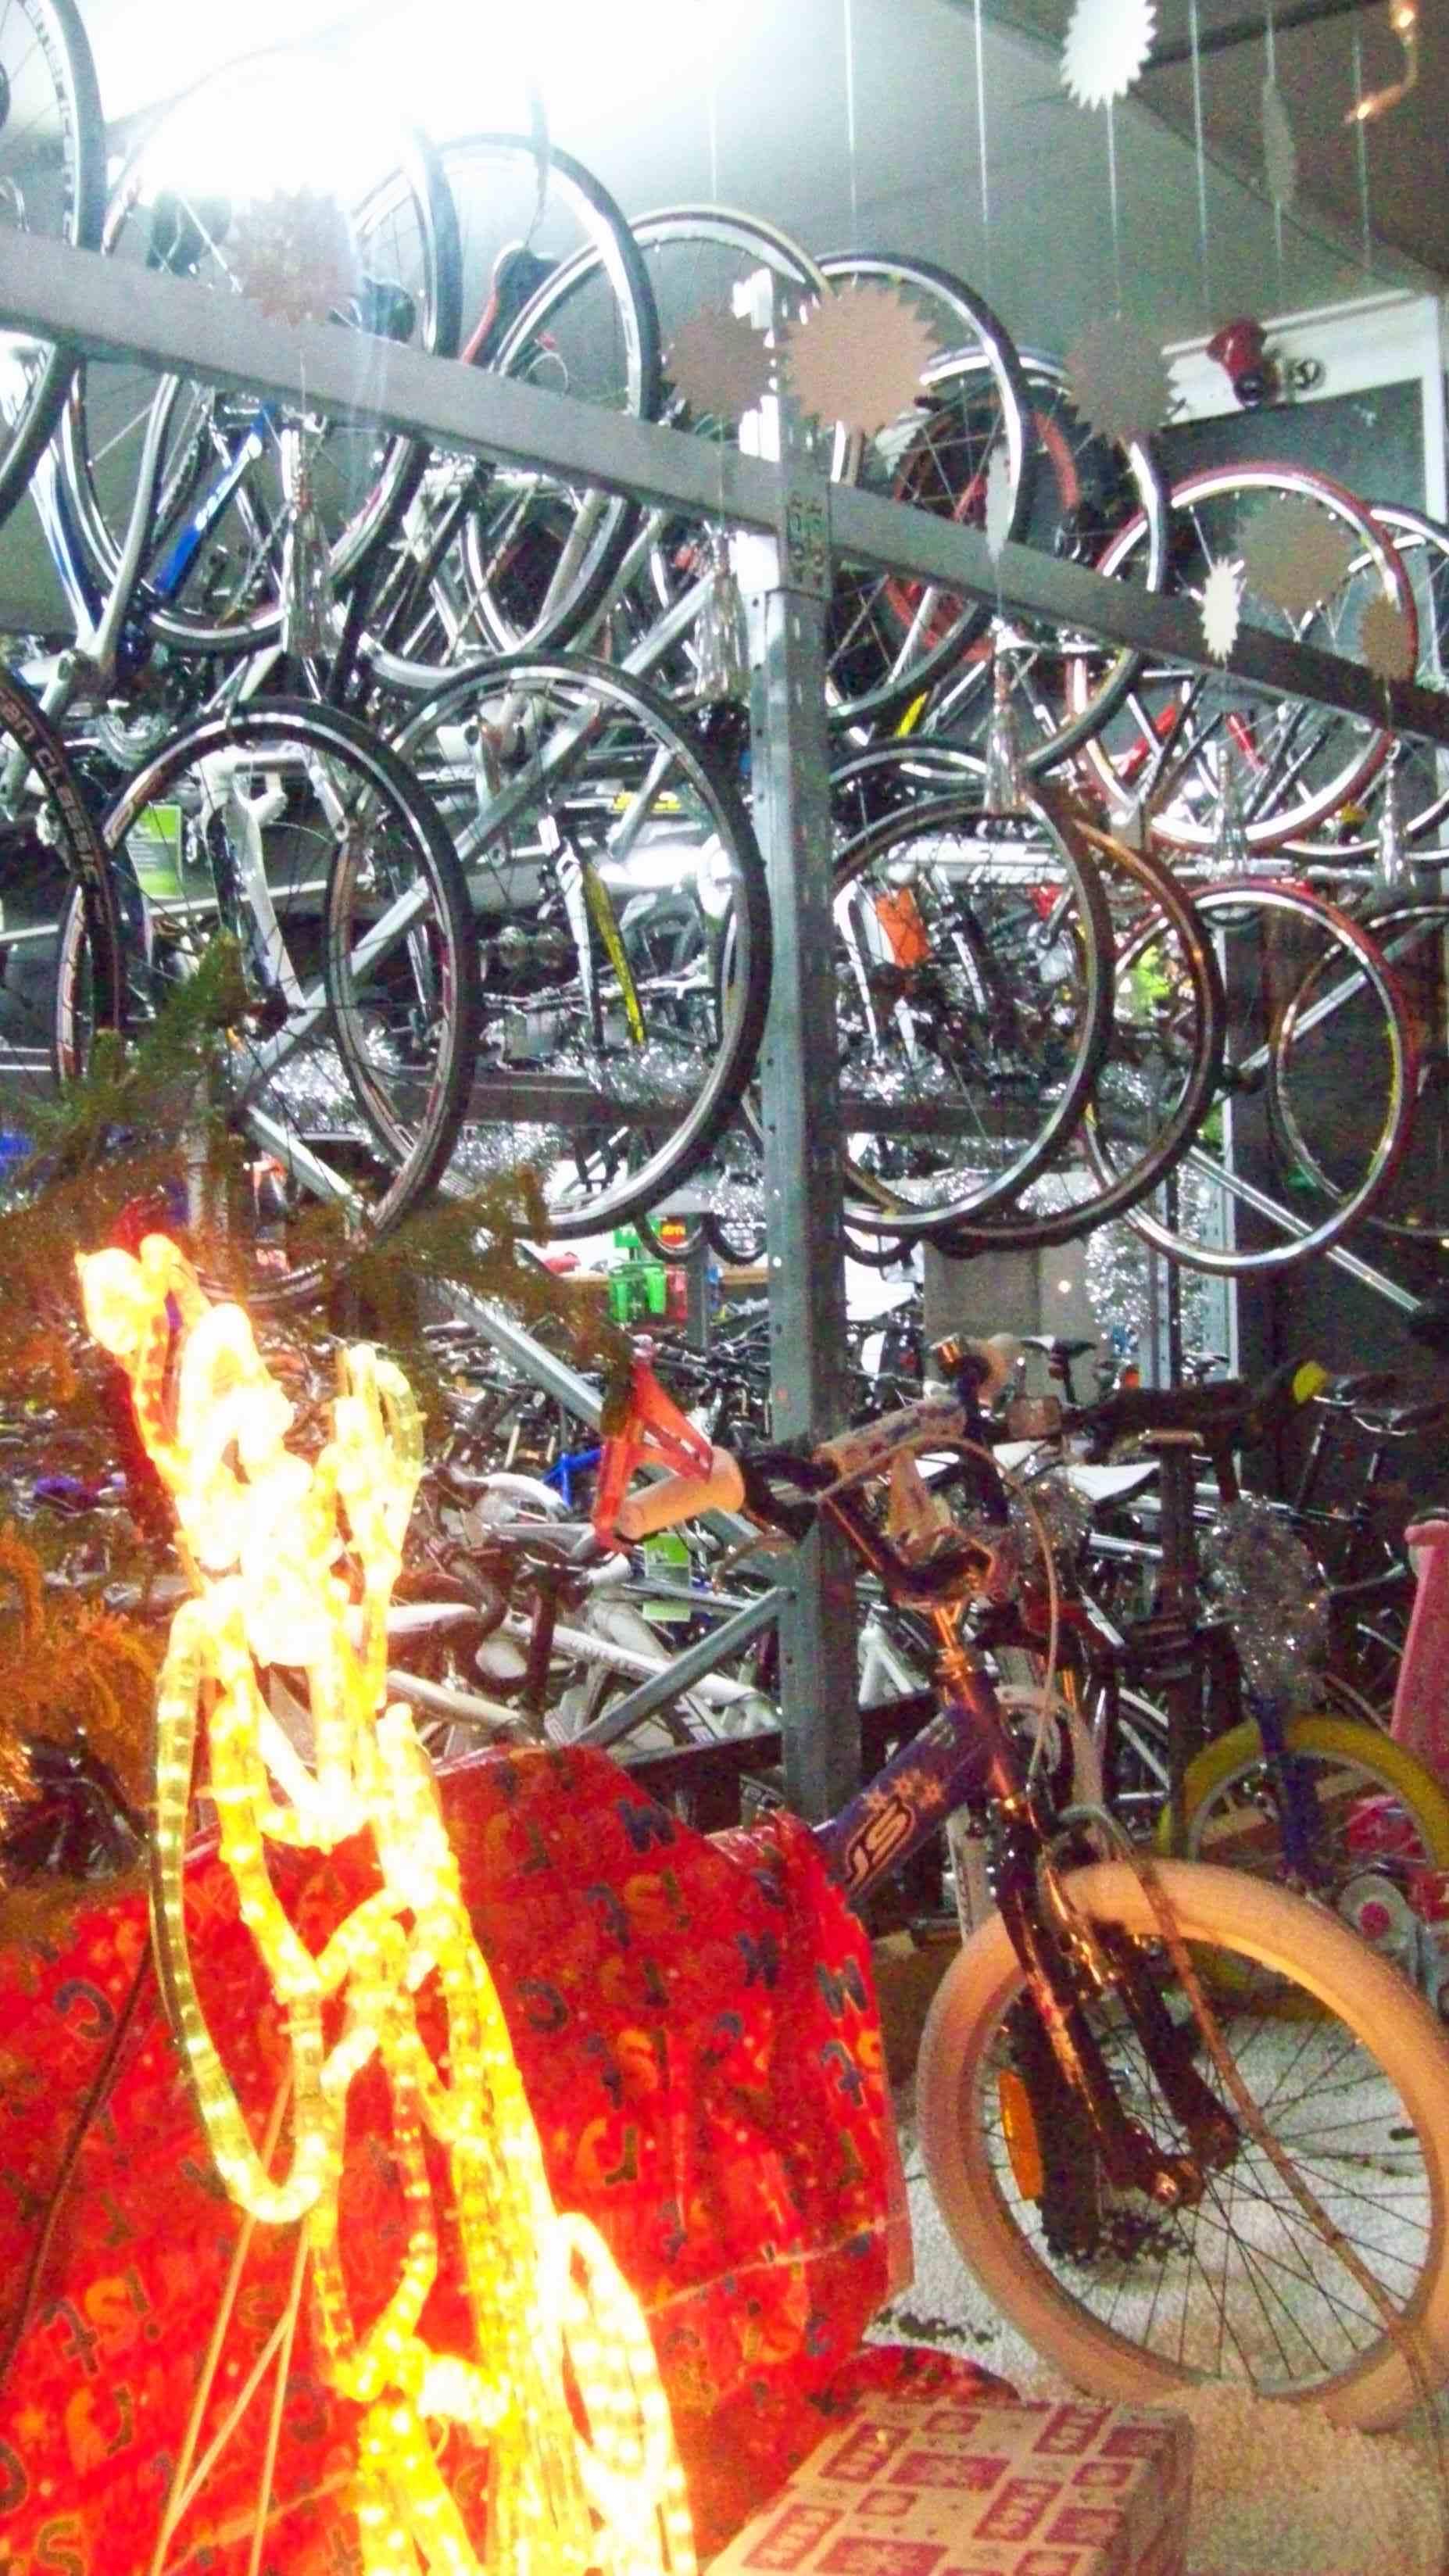 Bikes Retail, Bicycle, Night, Trial, Transport, HQ Photo